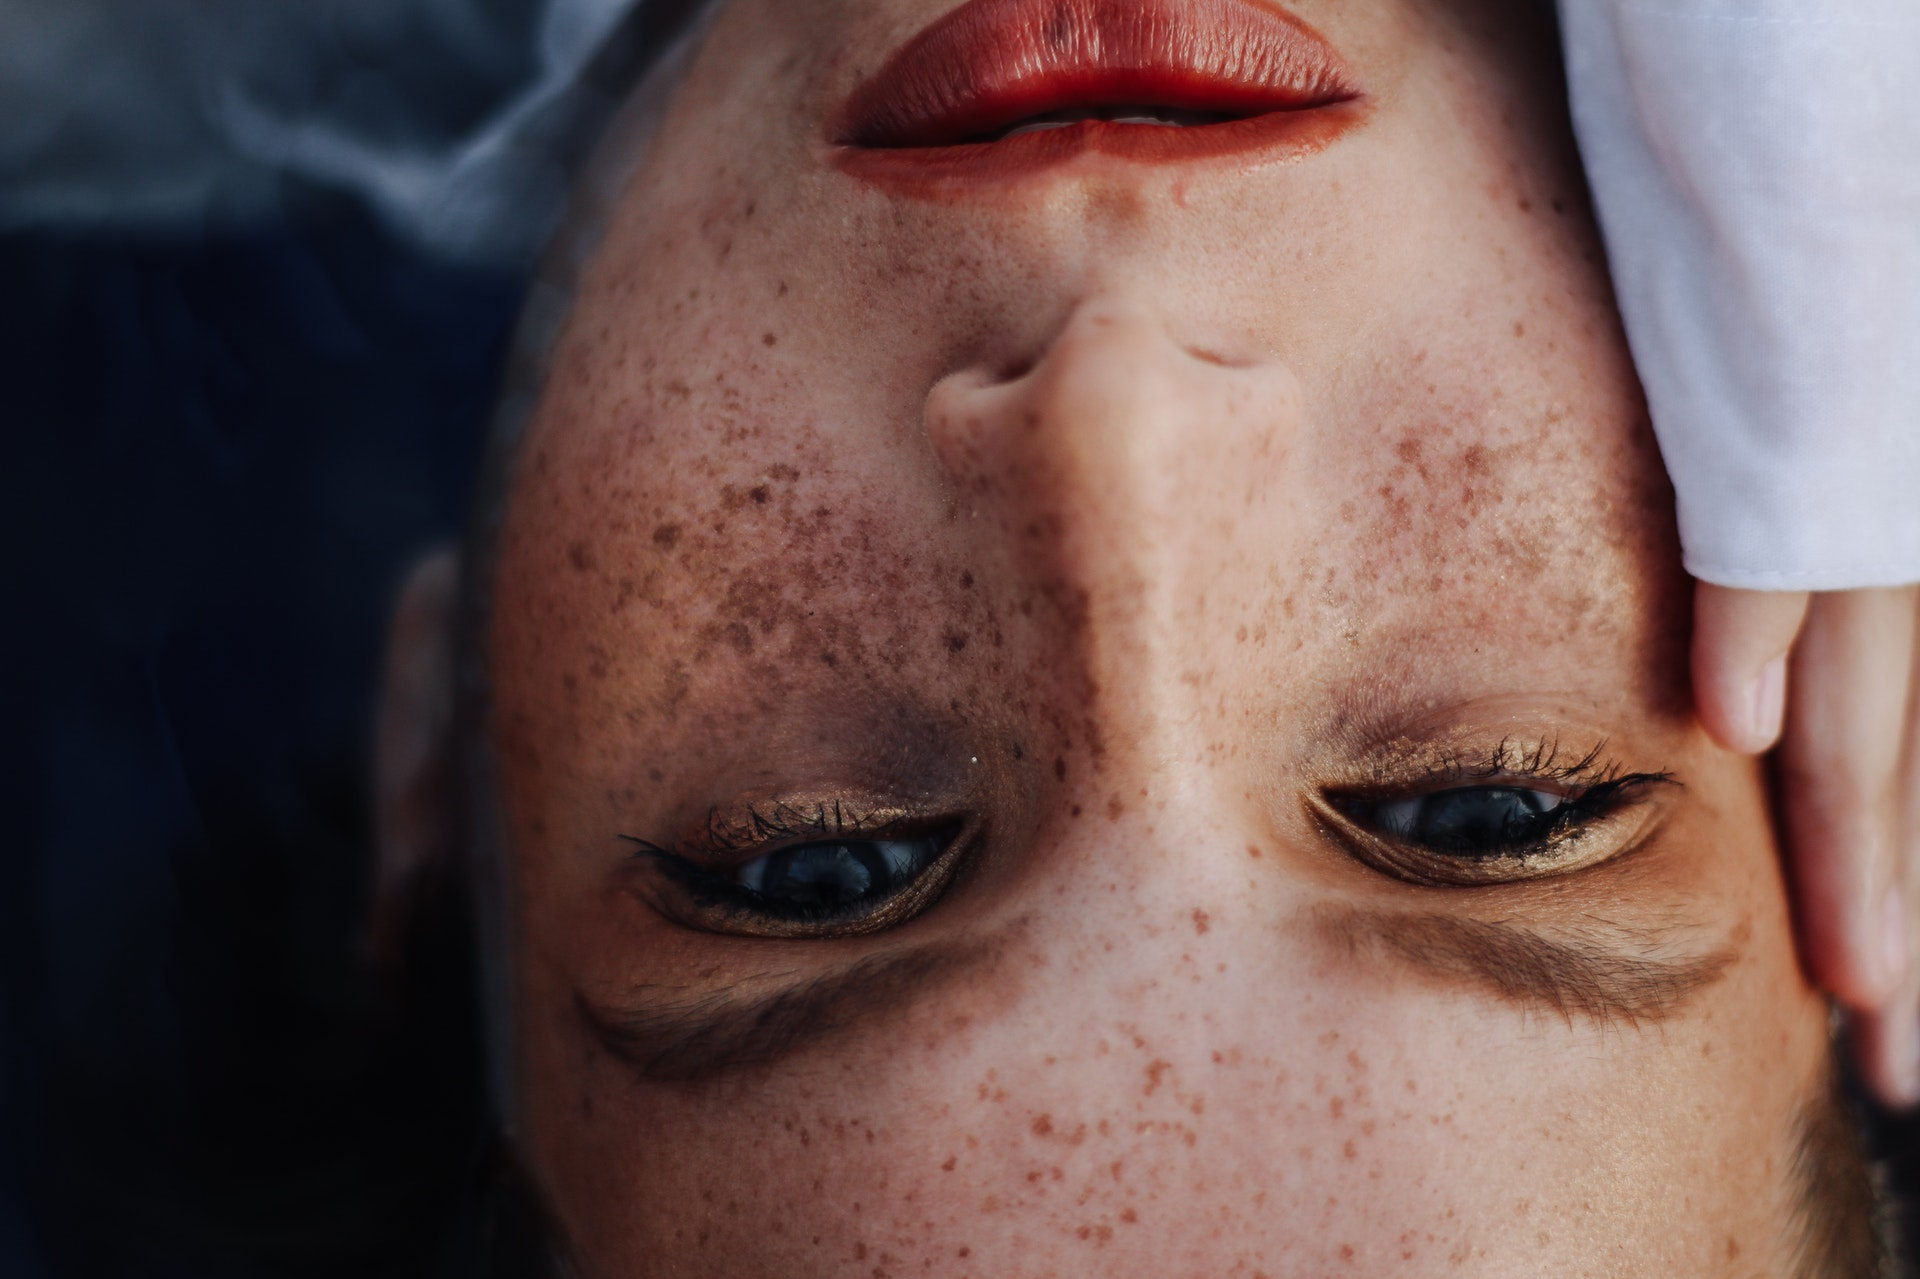 woman face upside down